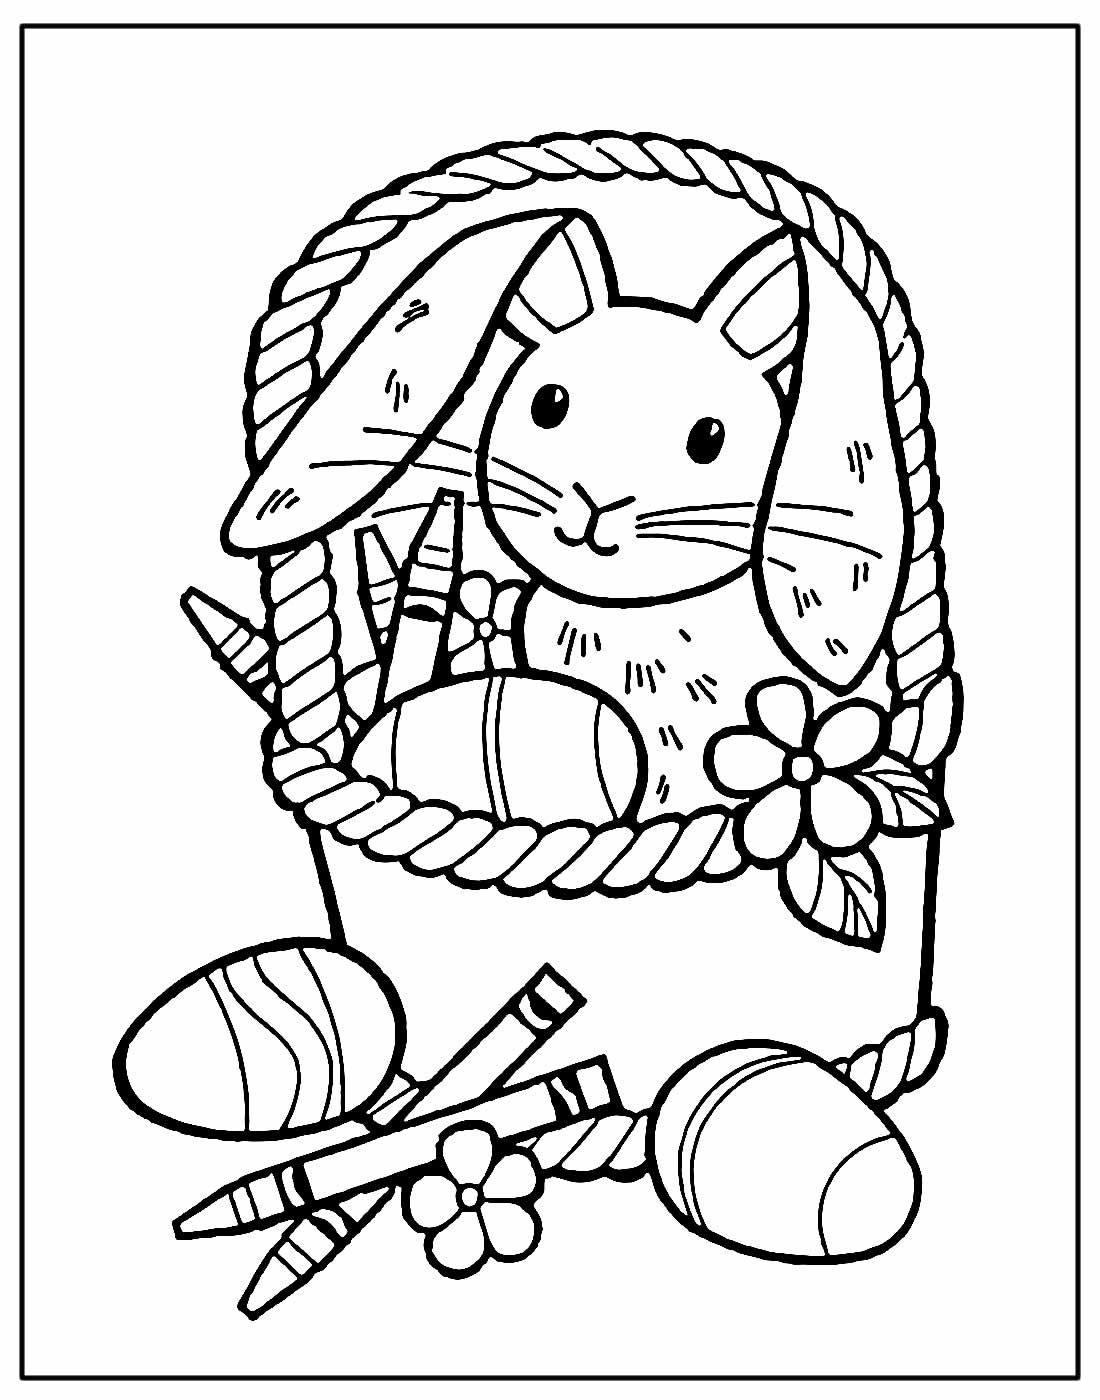 Desenho para colorir de Páscoa